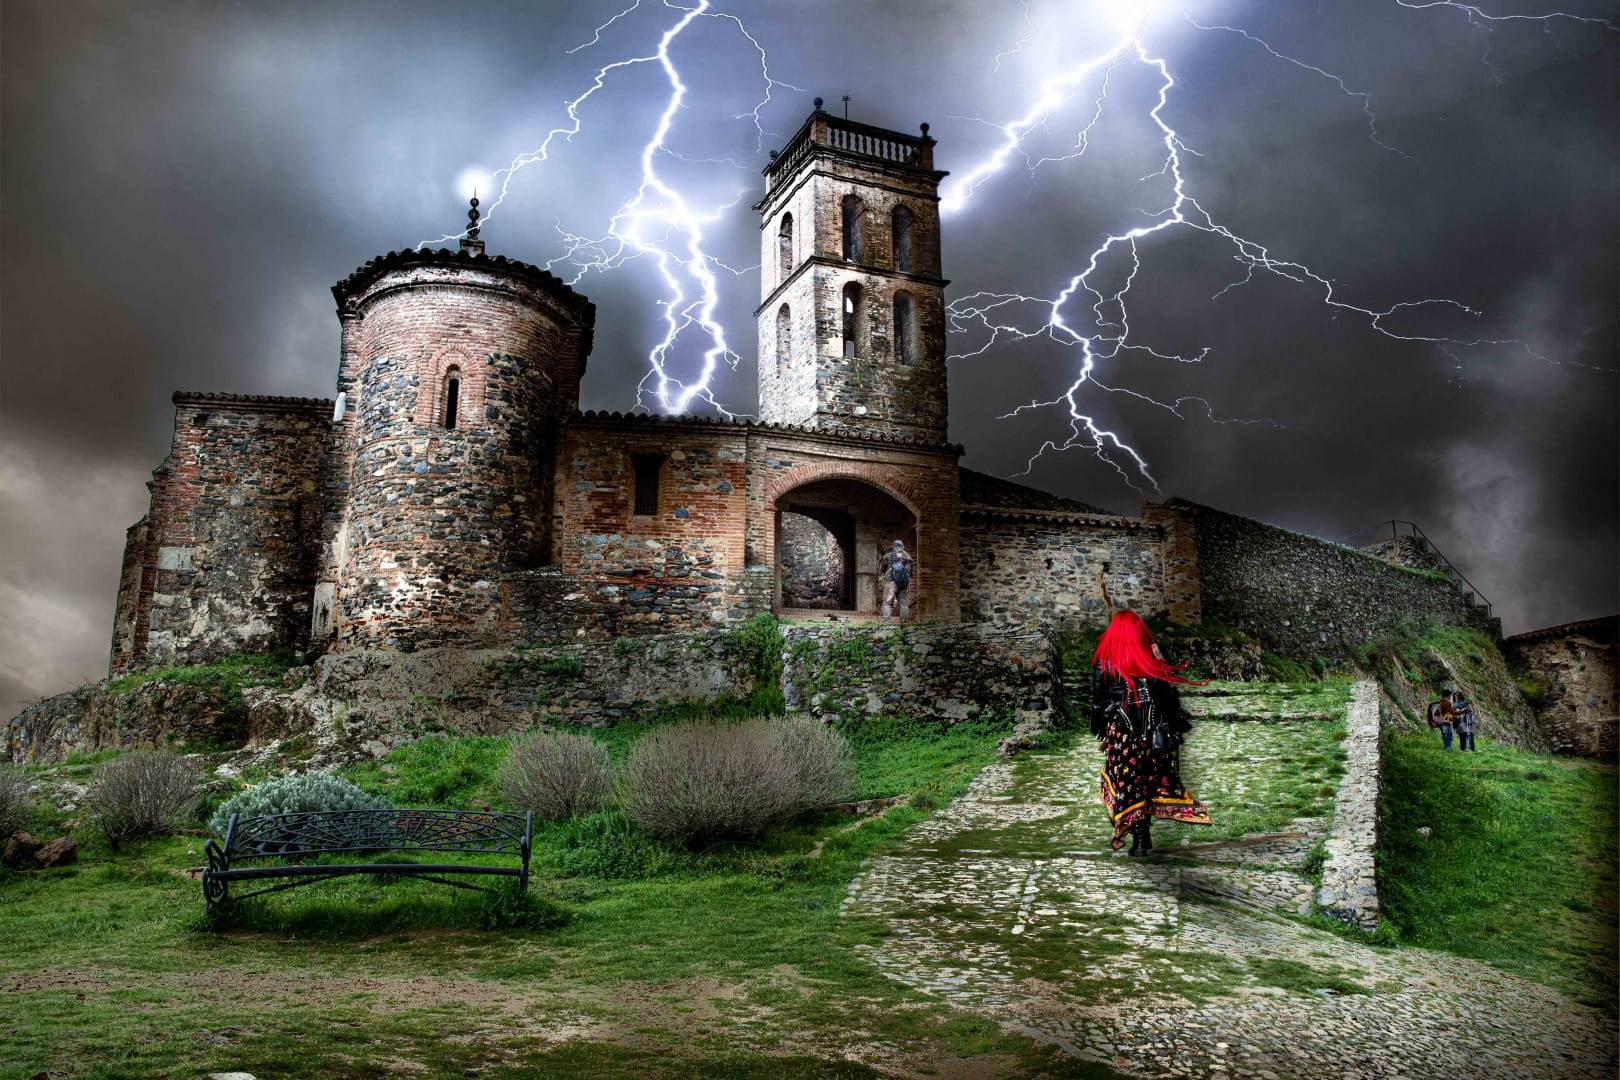 Tarde de tormenta en la Mezquita de Almonaster